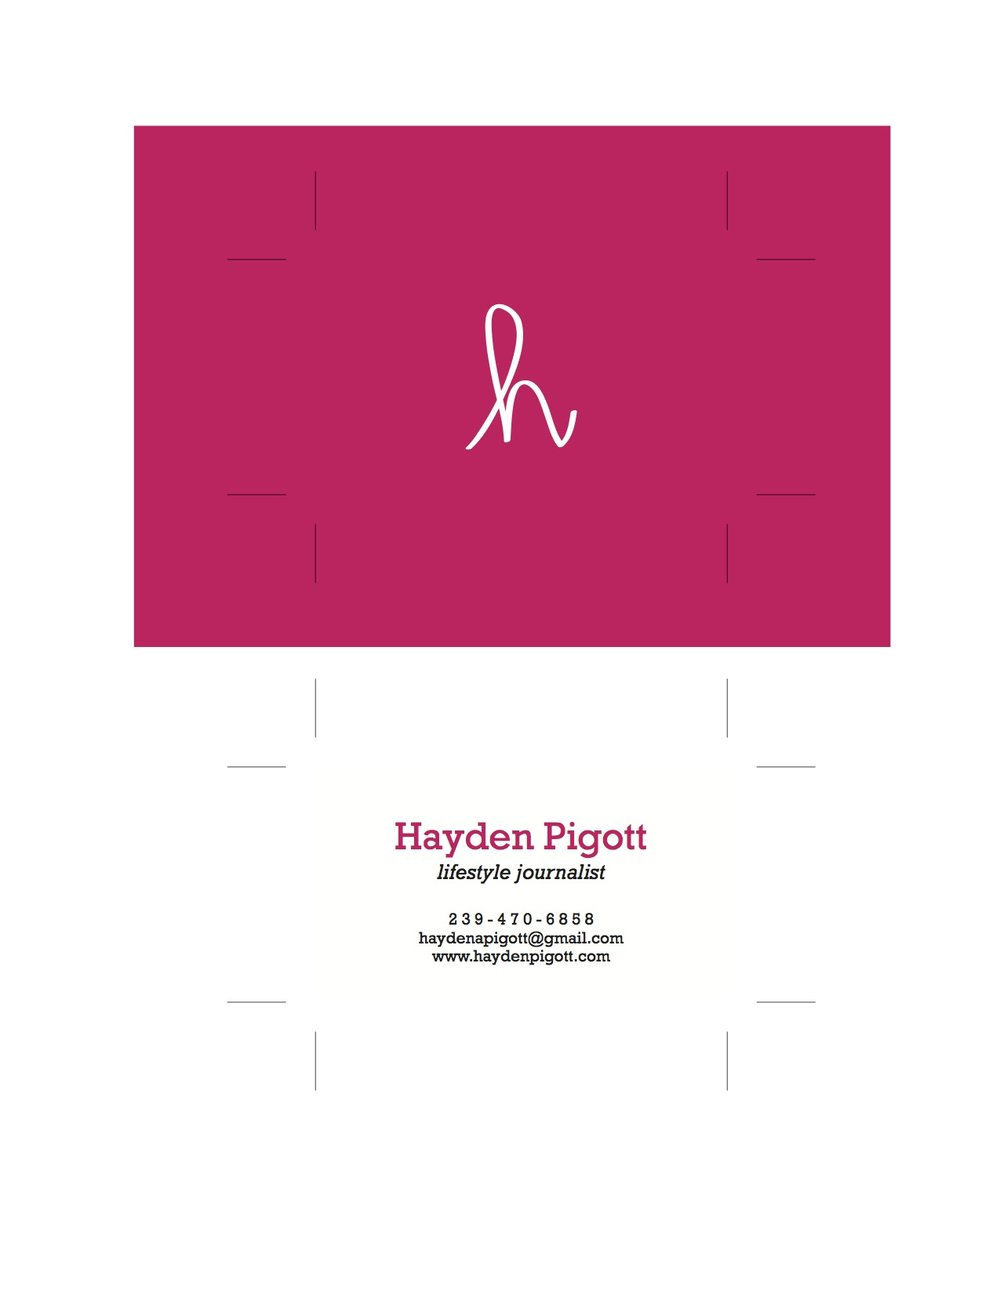 Draft Business Card.jpg